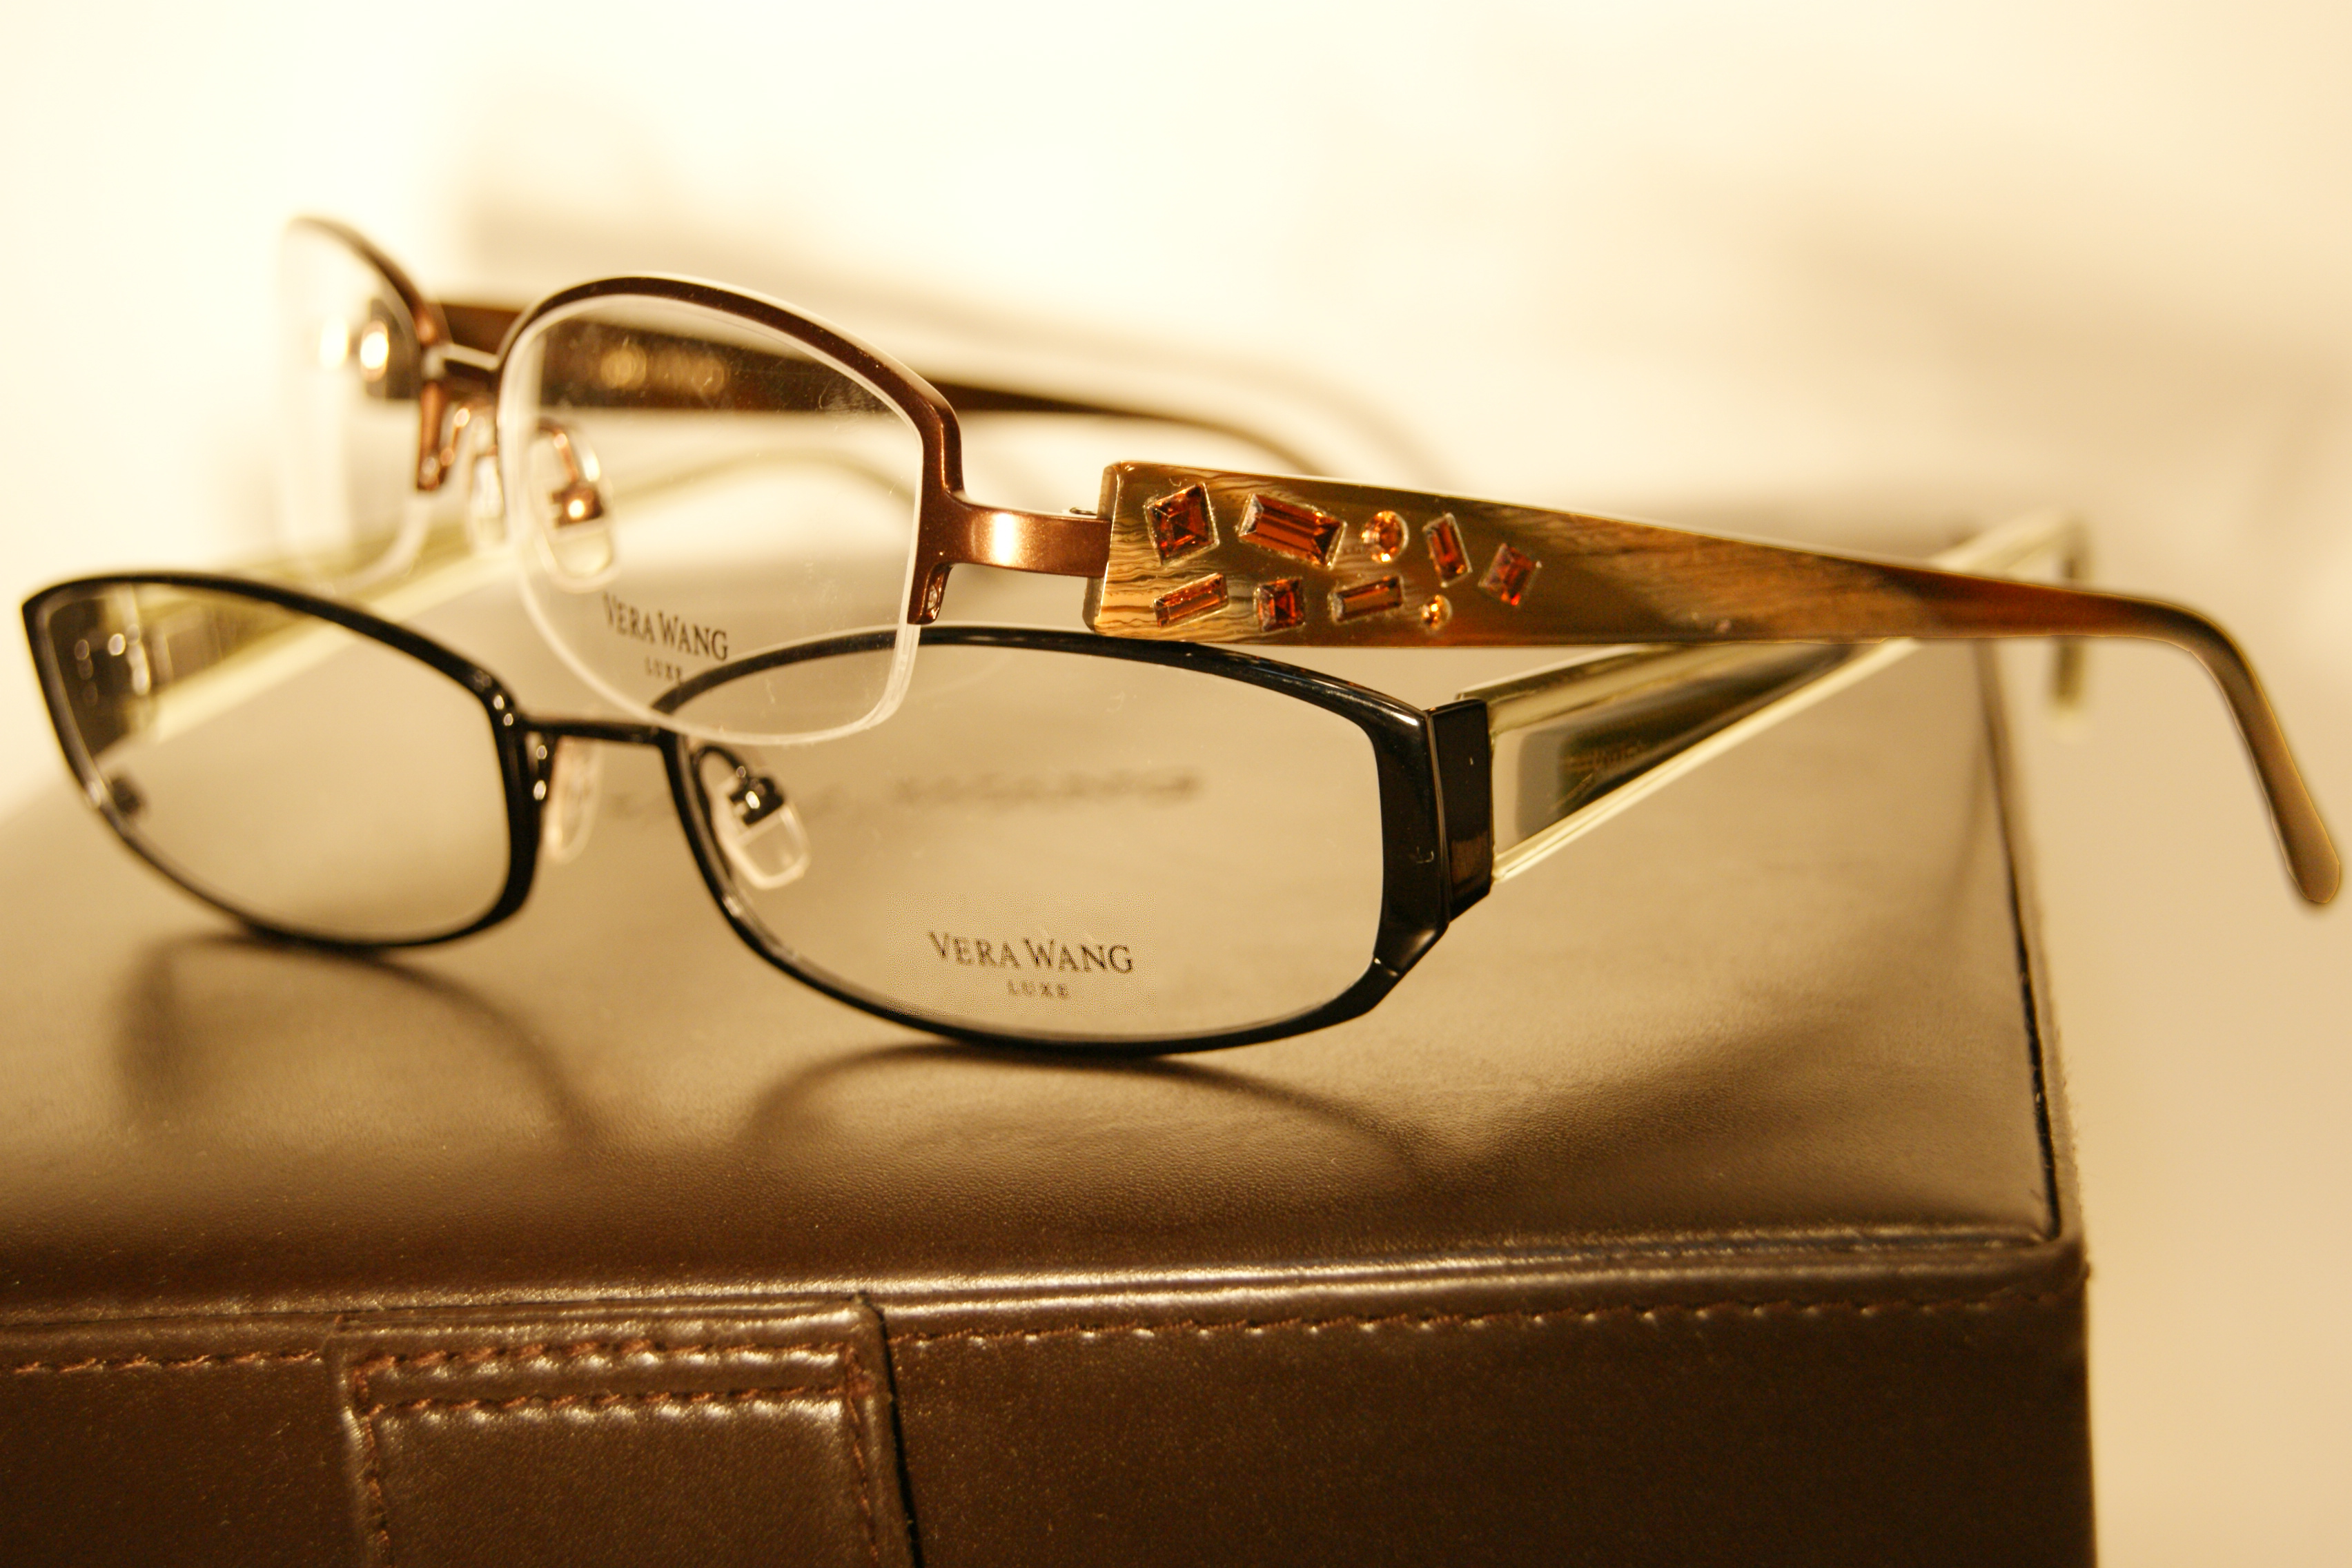 Vera Wang Eyeglass Frames - Compare Prices, Reviews and Buy at